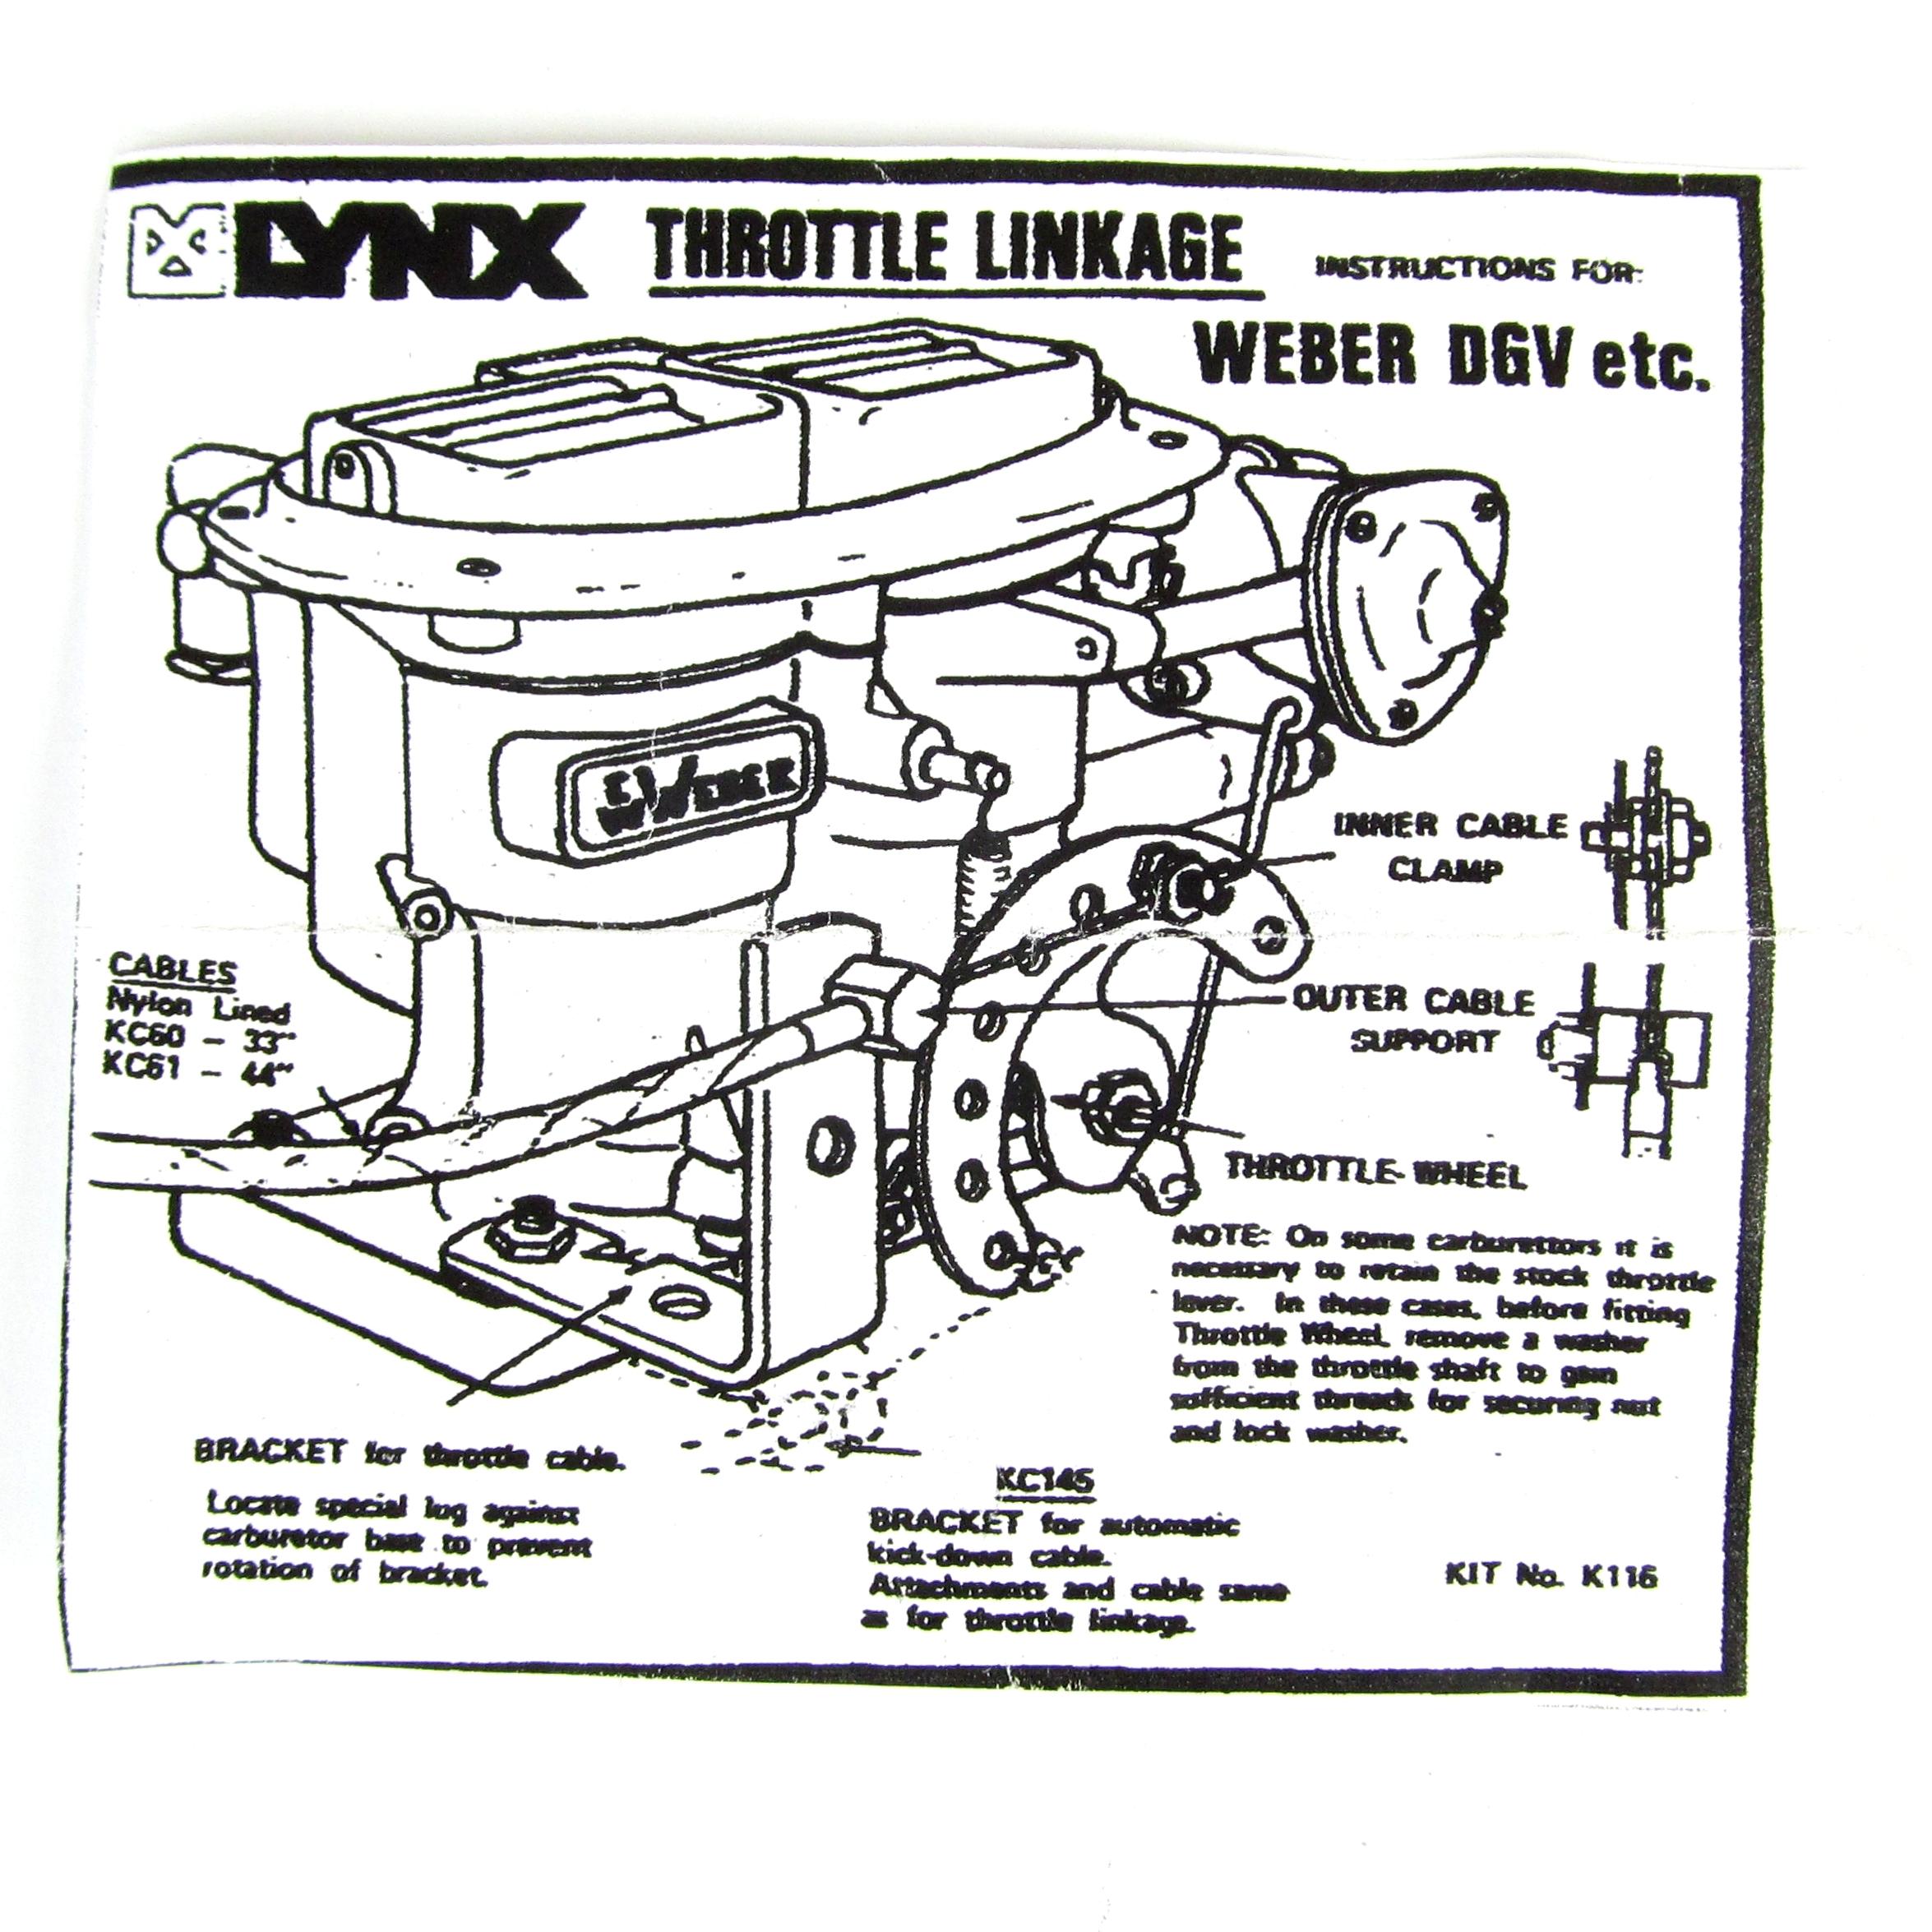 weber dgv,dgav,dgas,dgms,dcd,dgev carburettor throttle cable linkage kit